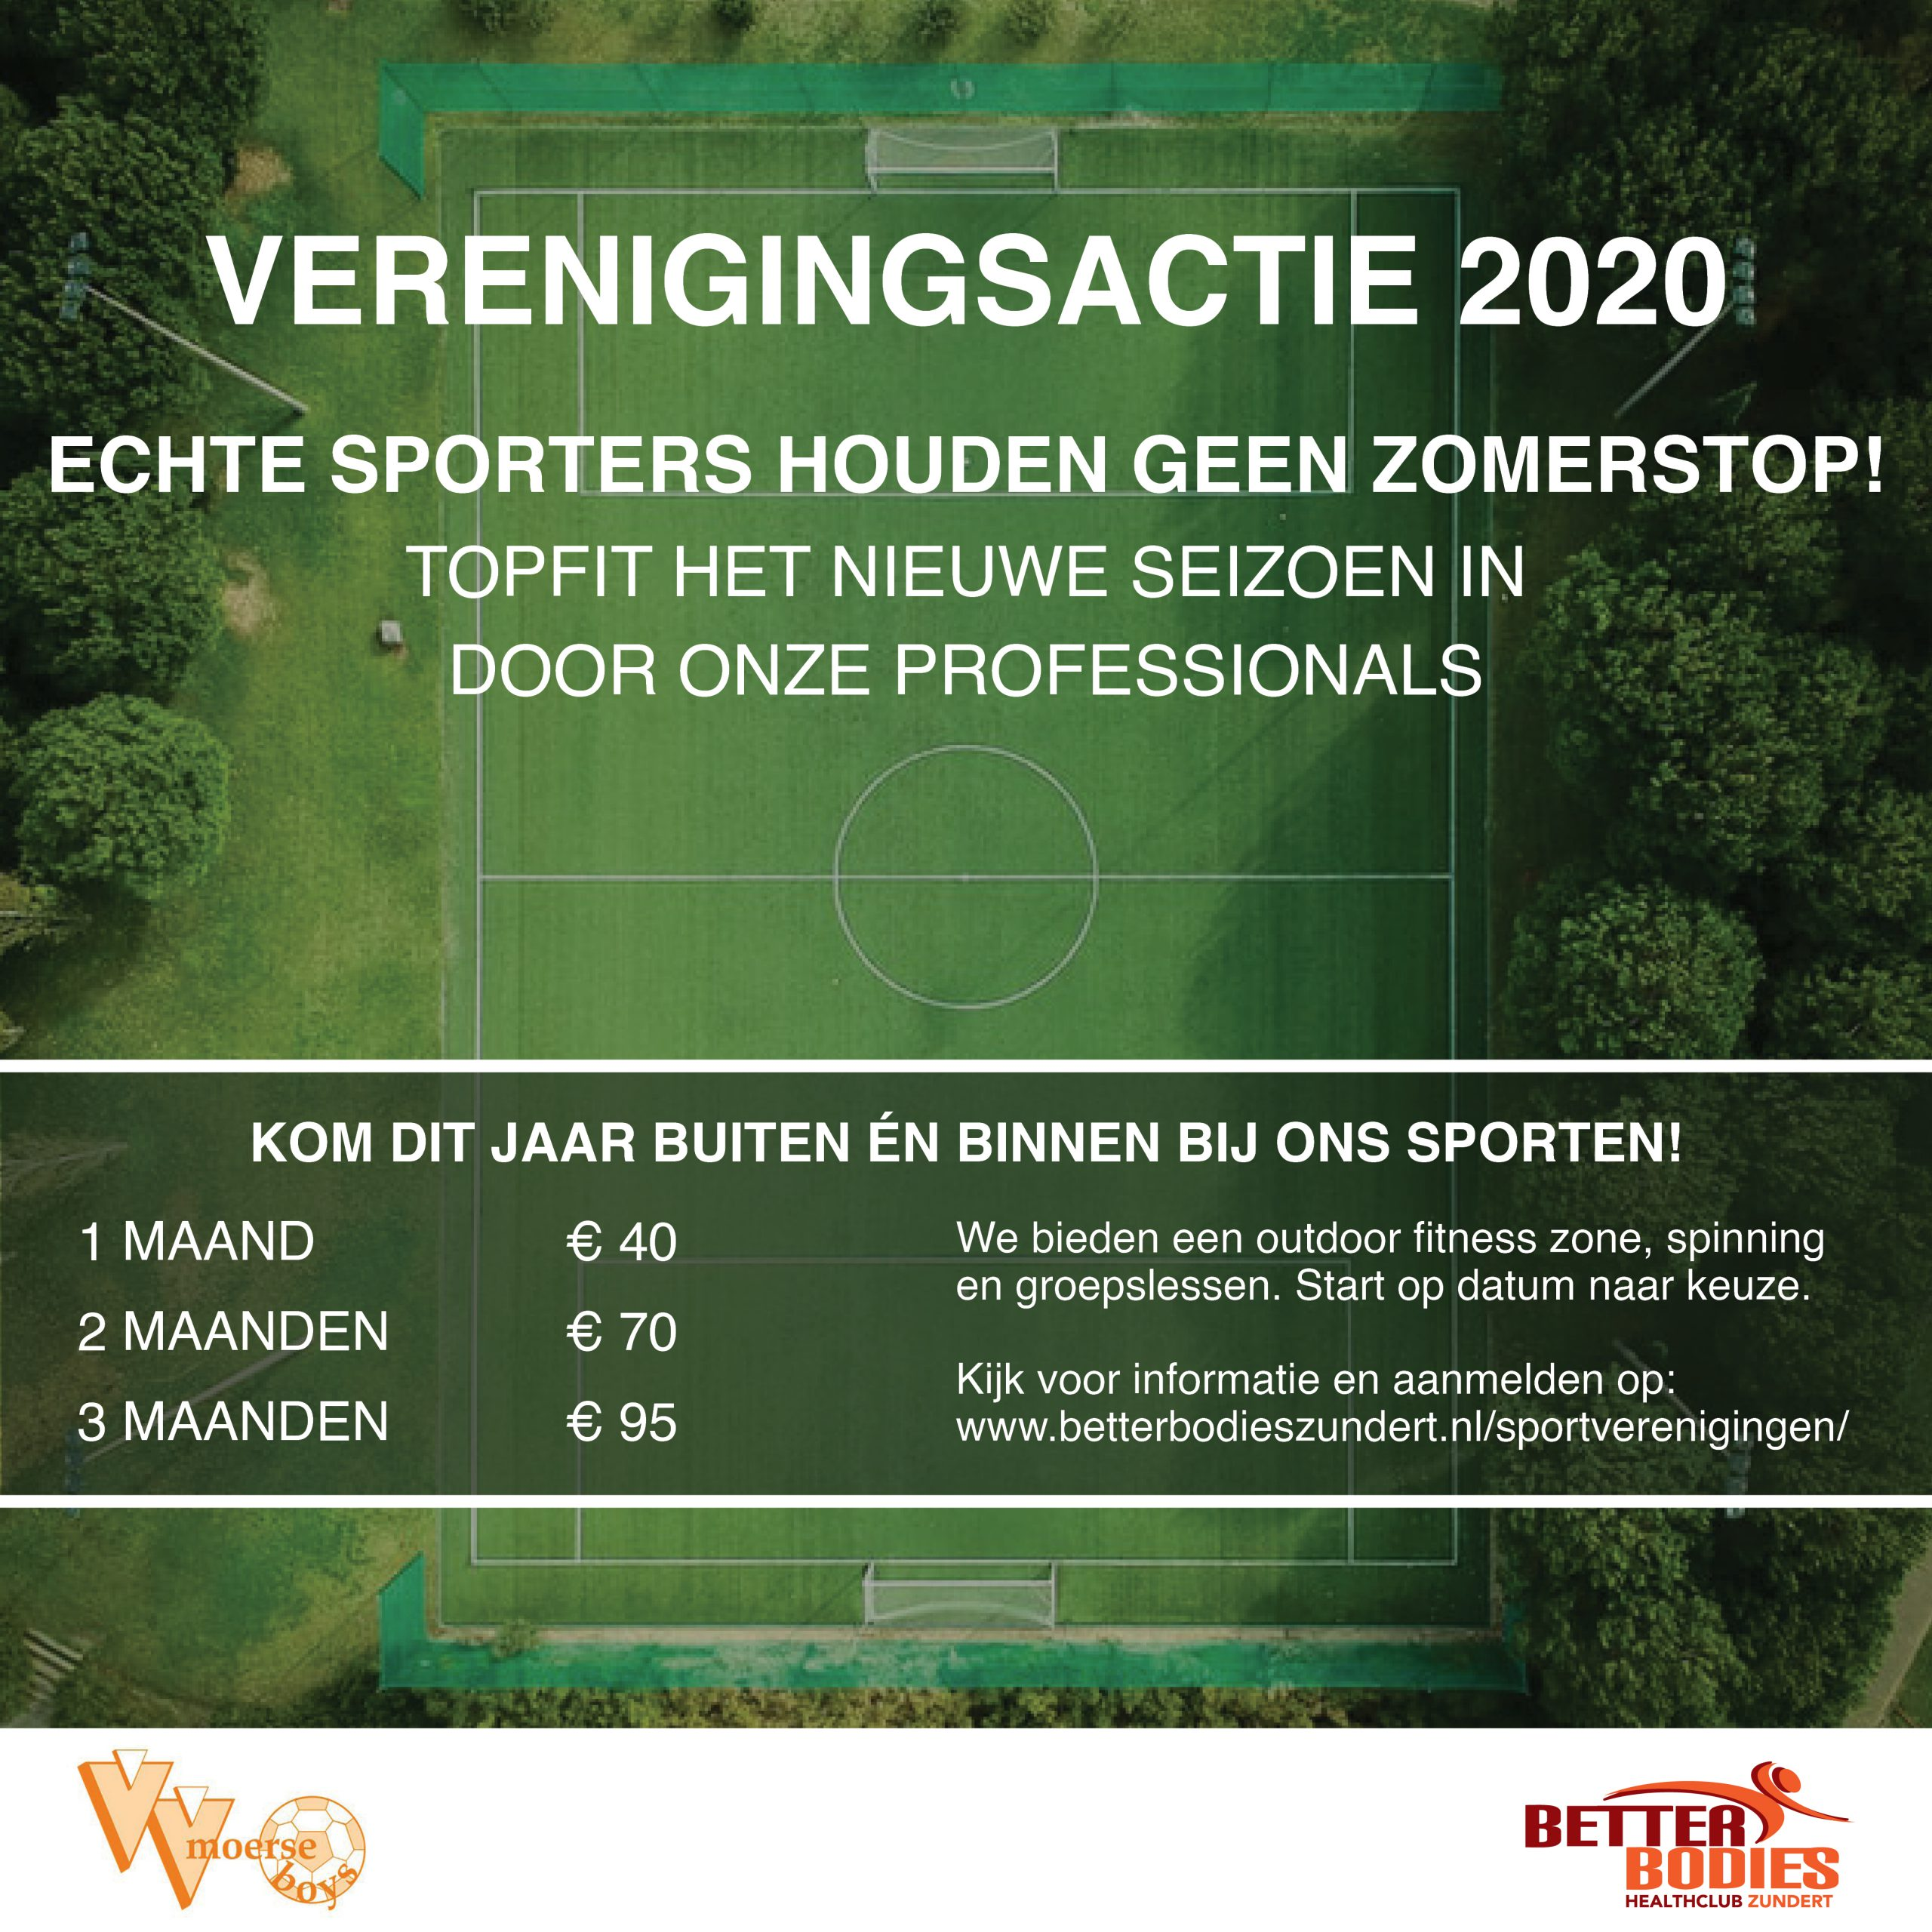 Verenigingsactie 2020 VV Moerse Boys 1 Scaled